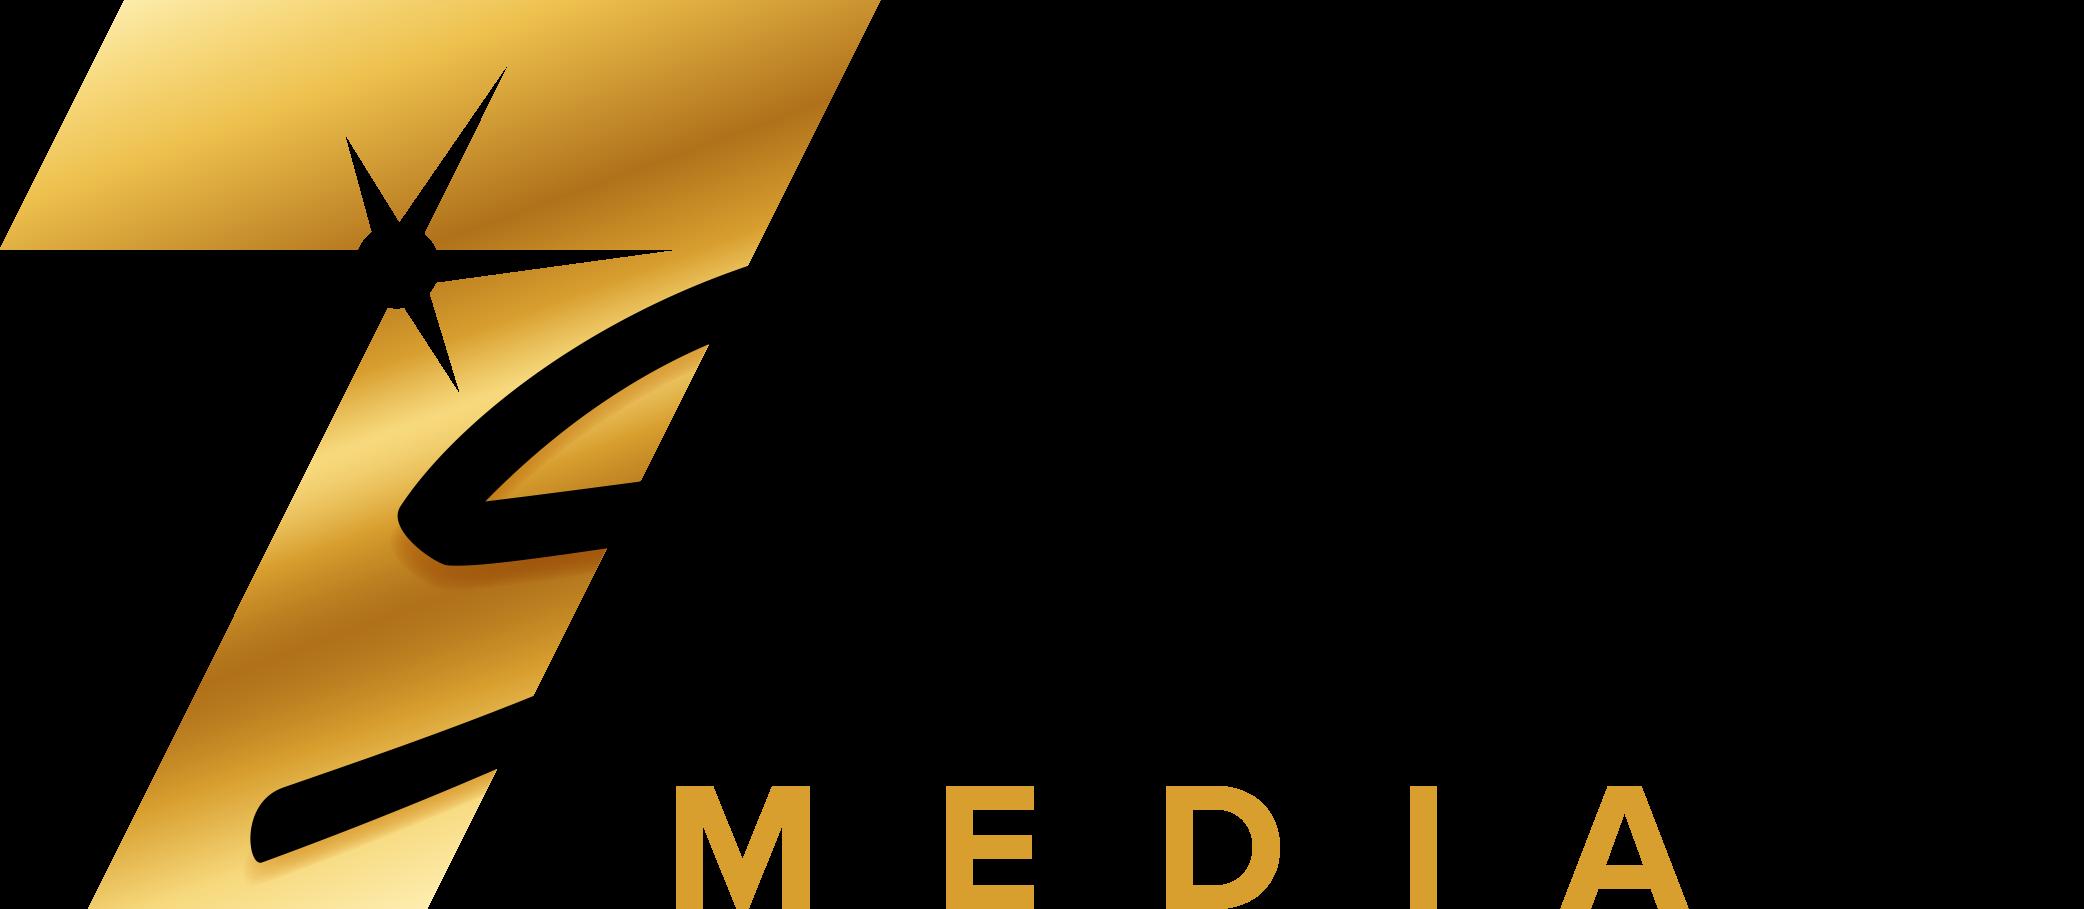 7 Seconds Media